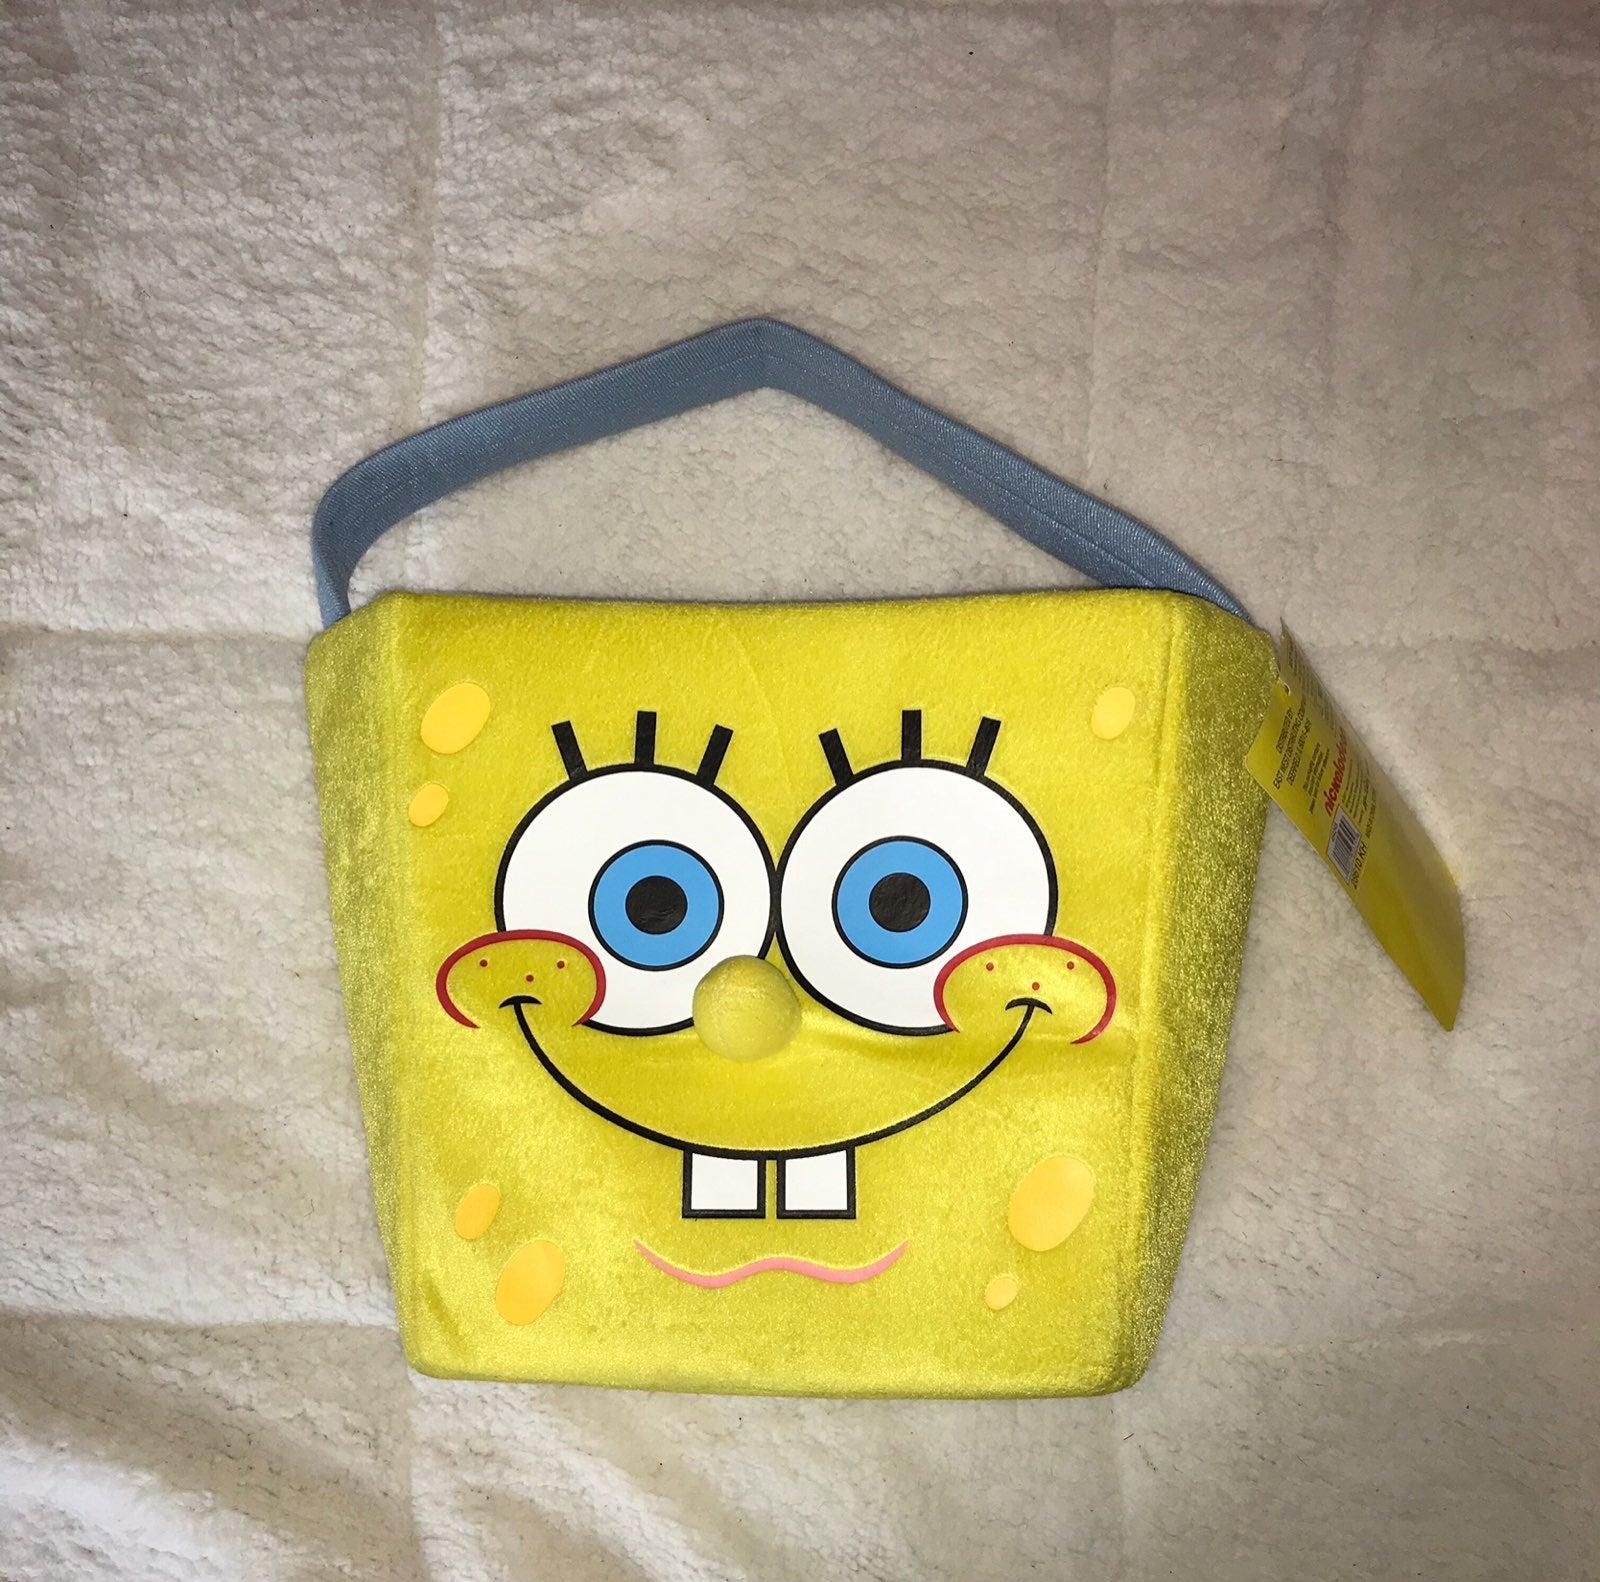 Spongebob SquarePants Easter Basket